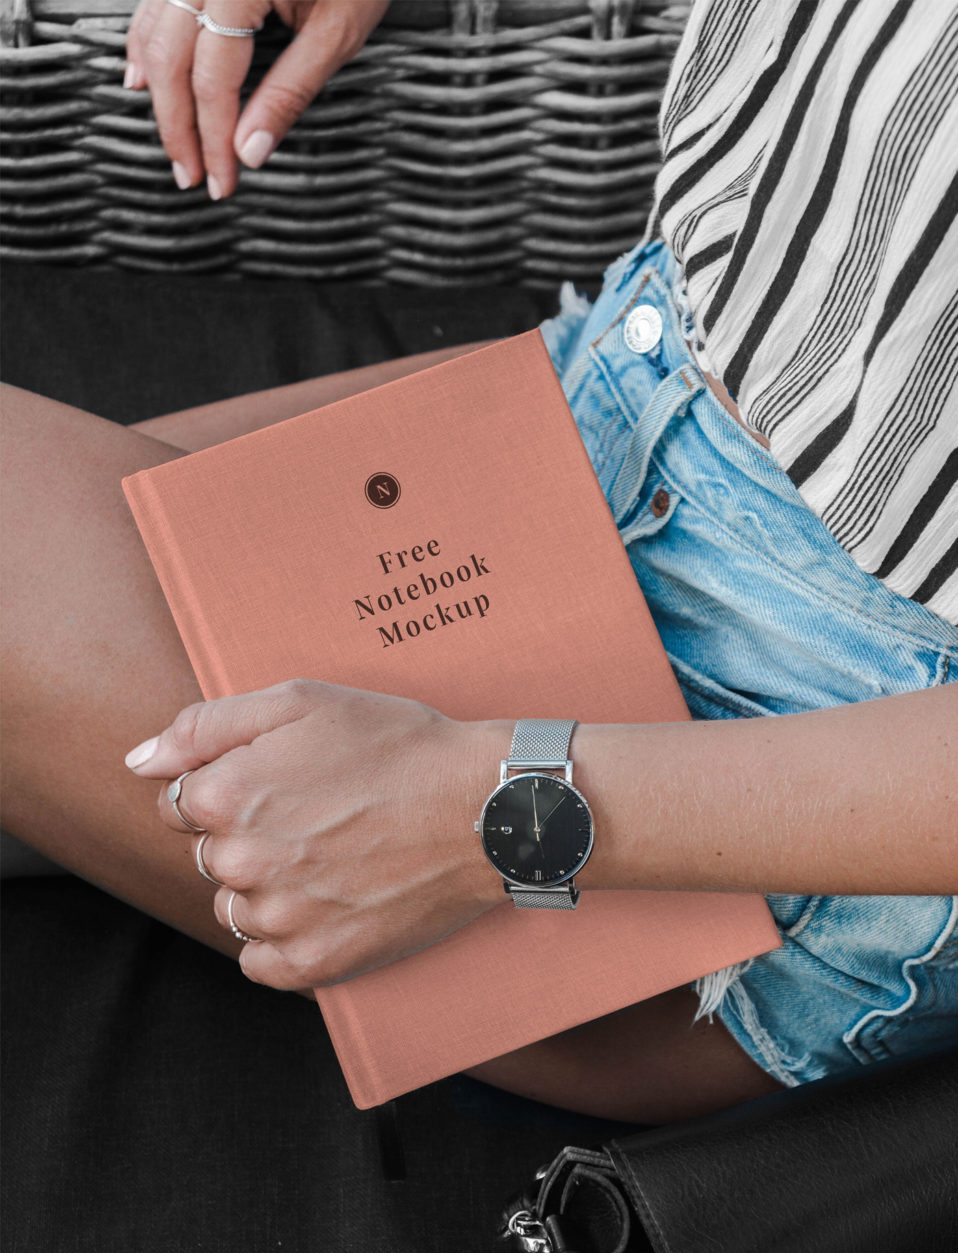 Hand Holding Notebook - Free Mockup